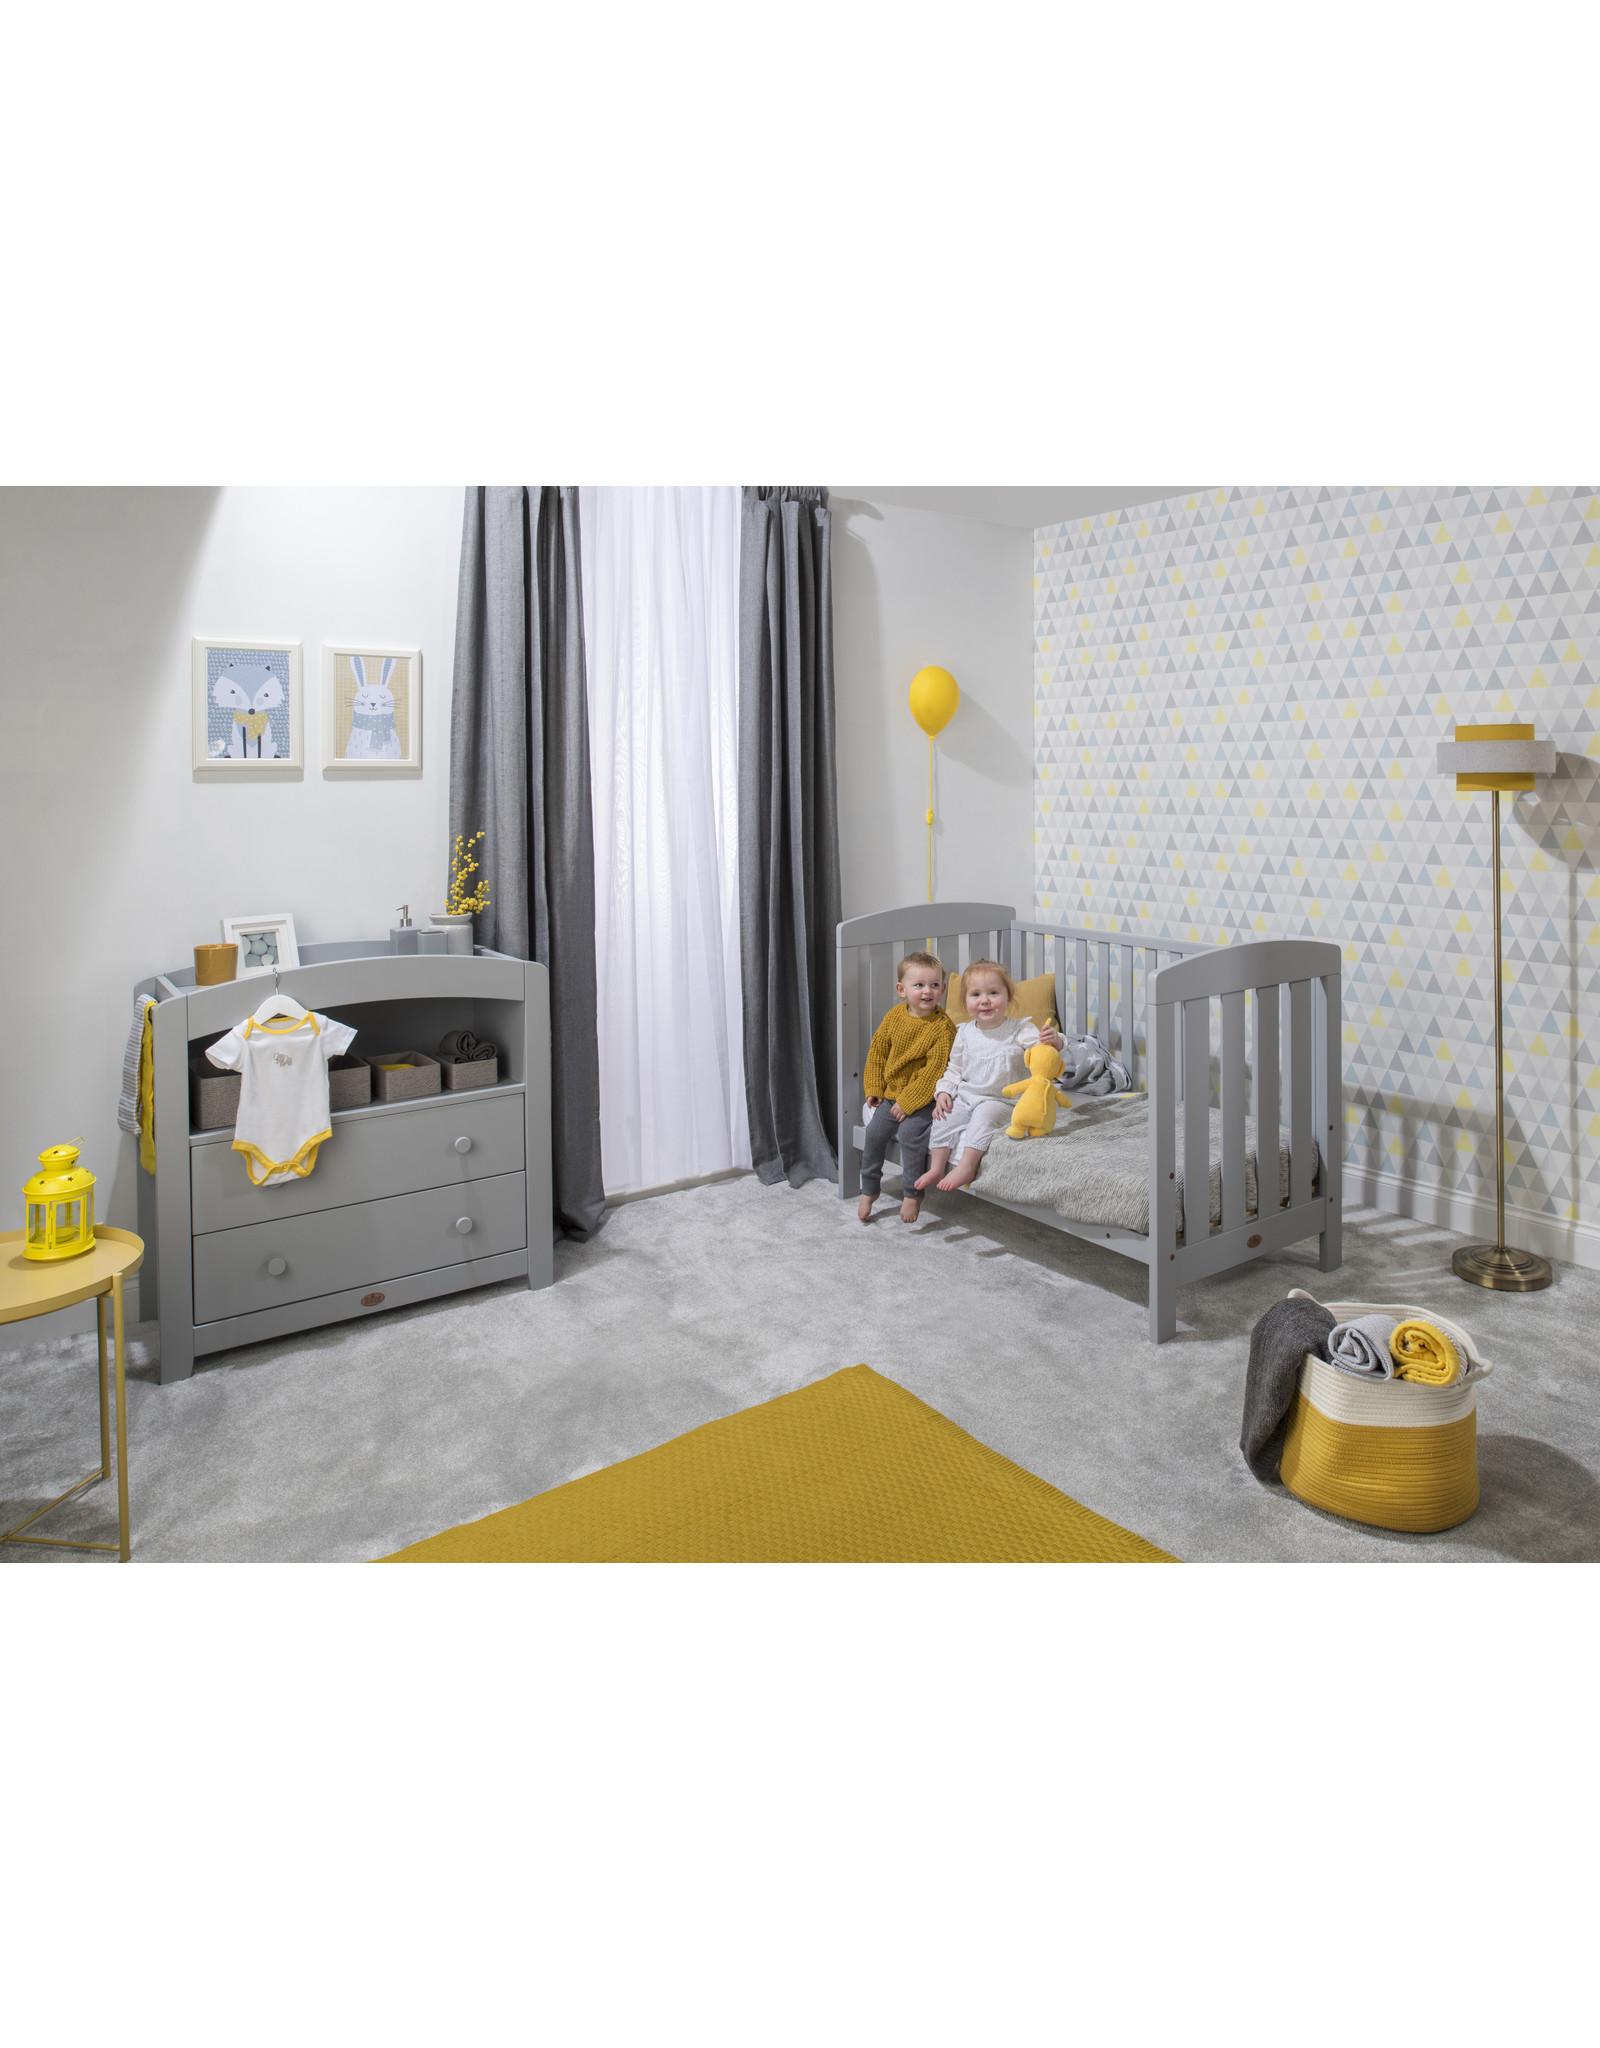 Boori Alice 2 Piece Nursery Set with Chest Changer -Pebble